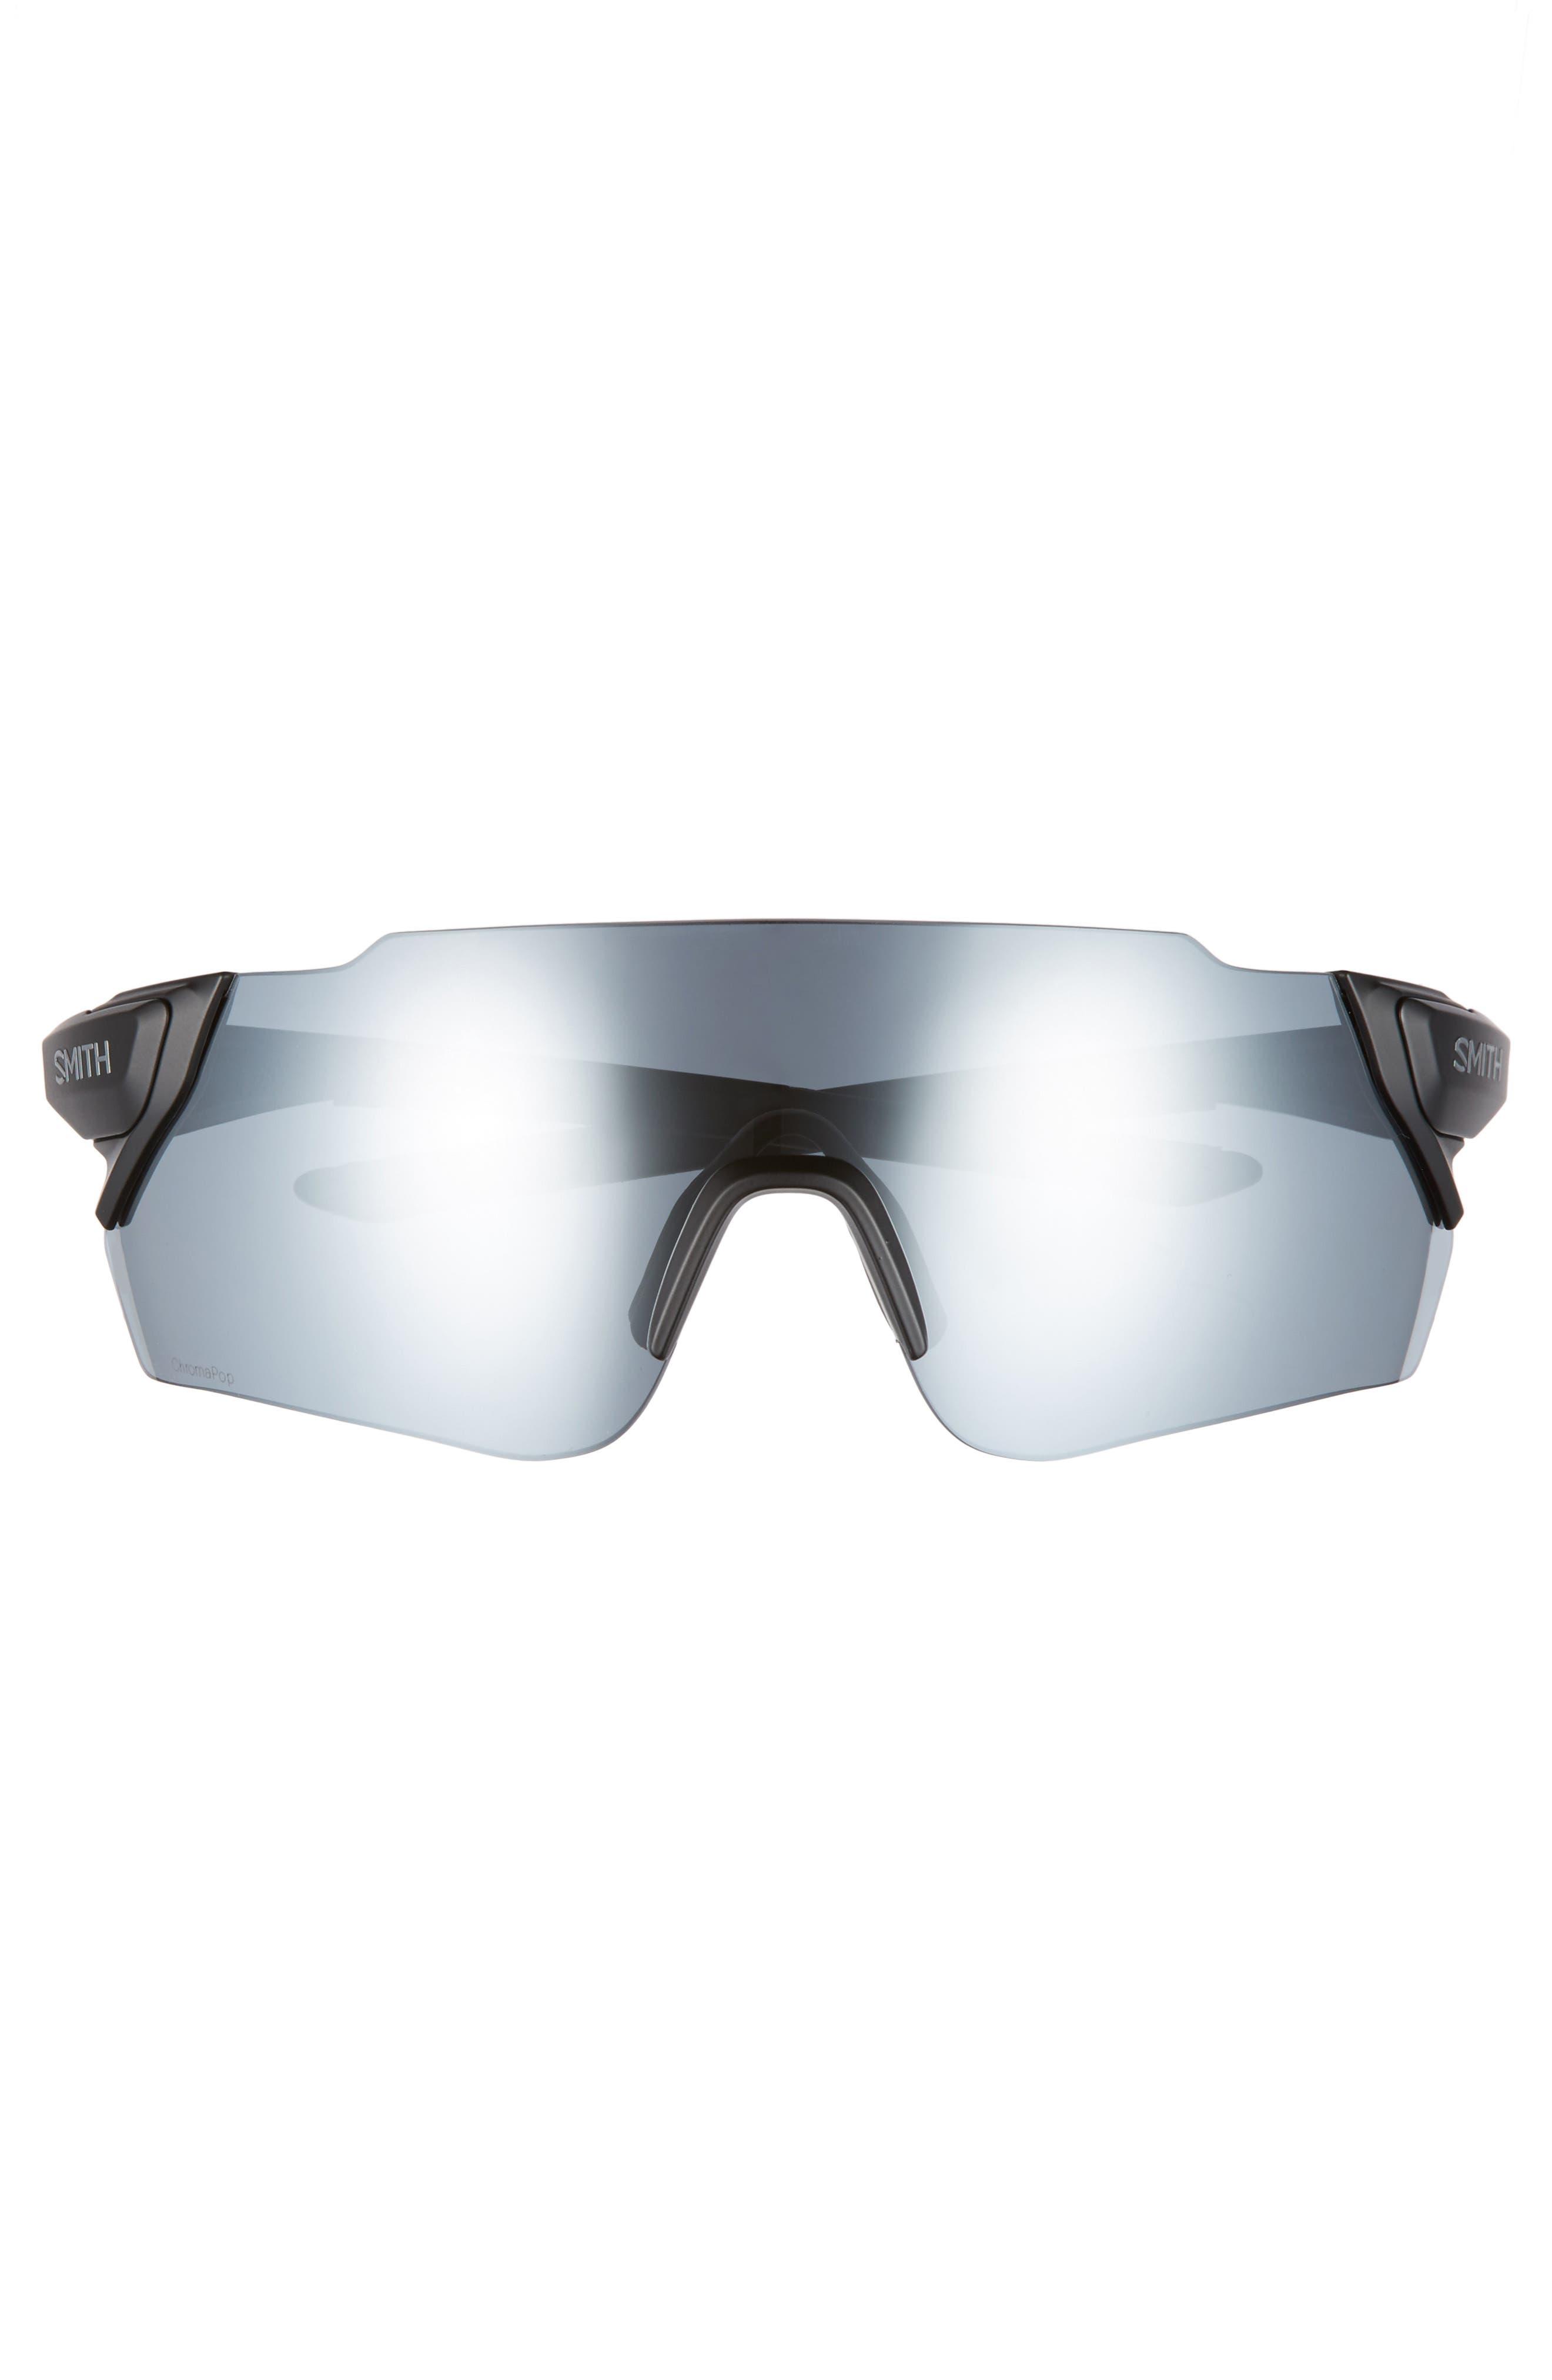 Attack Max 125mm ChromaPop<sup>™</sup> Polarized Shield Sunglasses,                             Alternate thumbnail 4, color,                             002